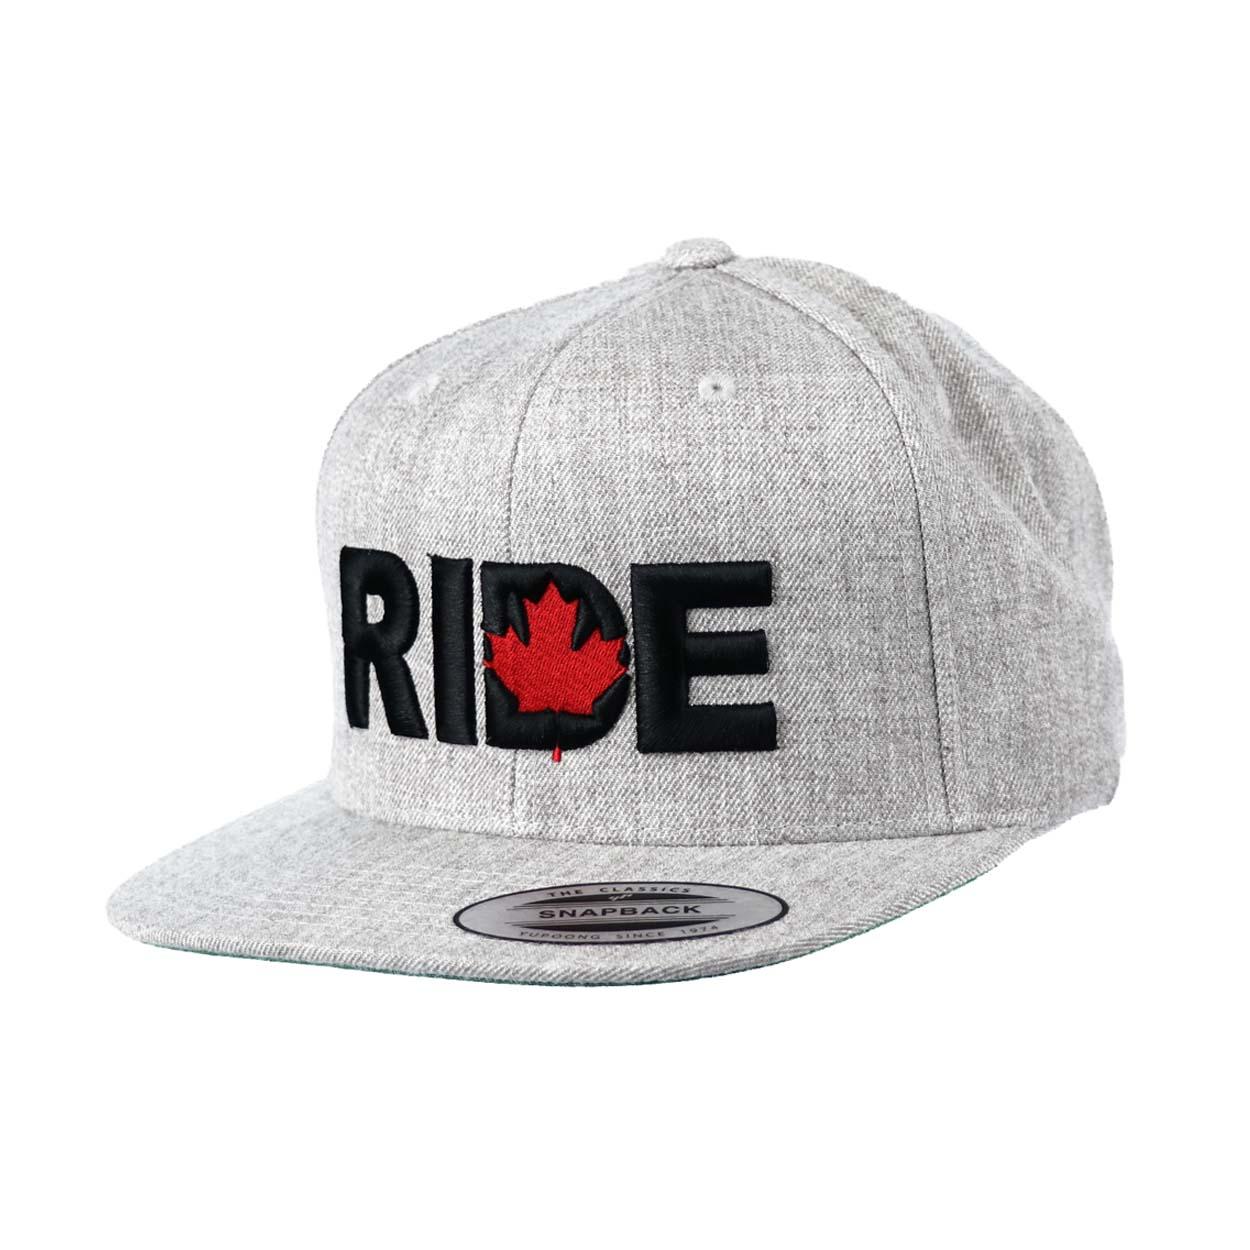 Ride Canada Classic Embroidered  Snapback Flat Brim Hat Gray/Black